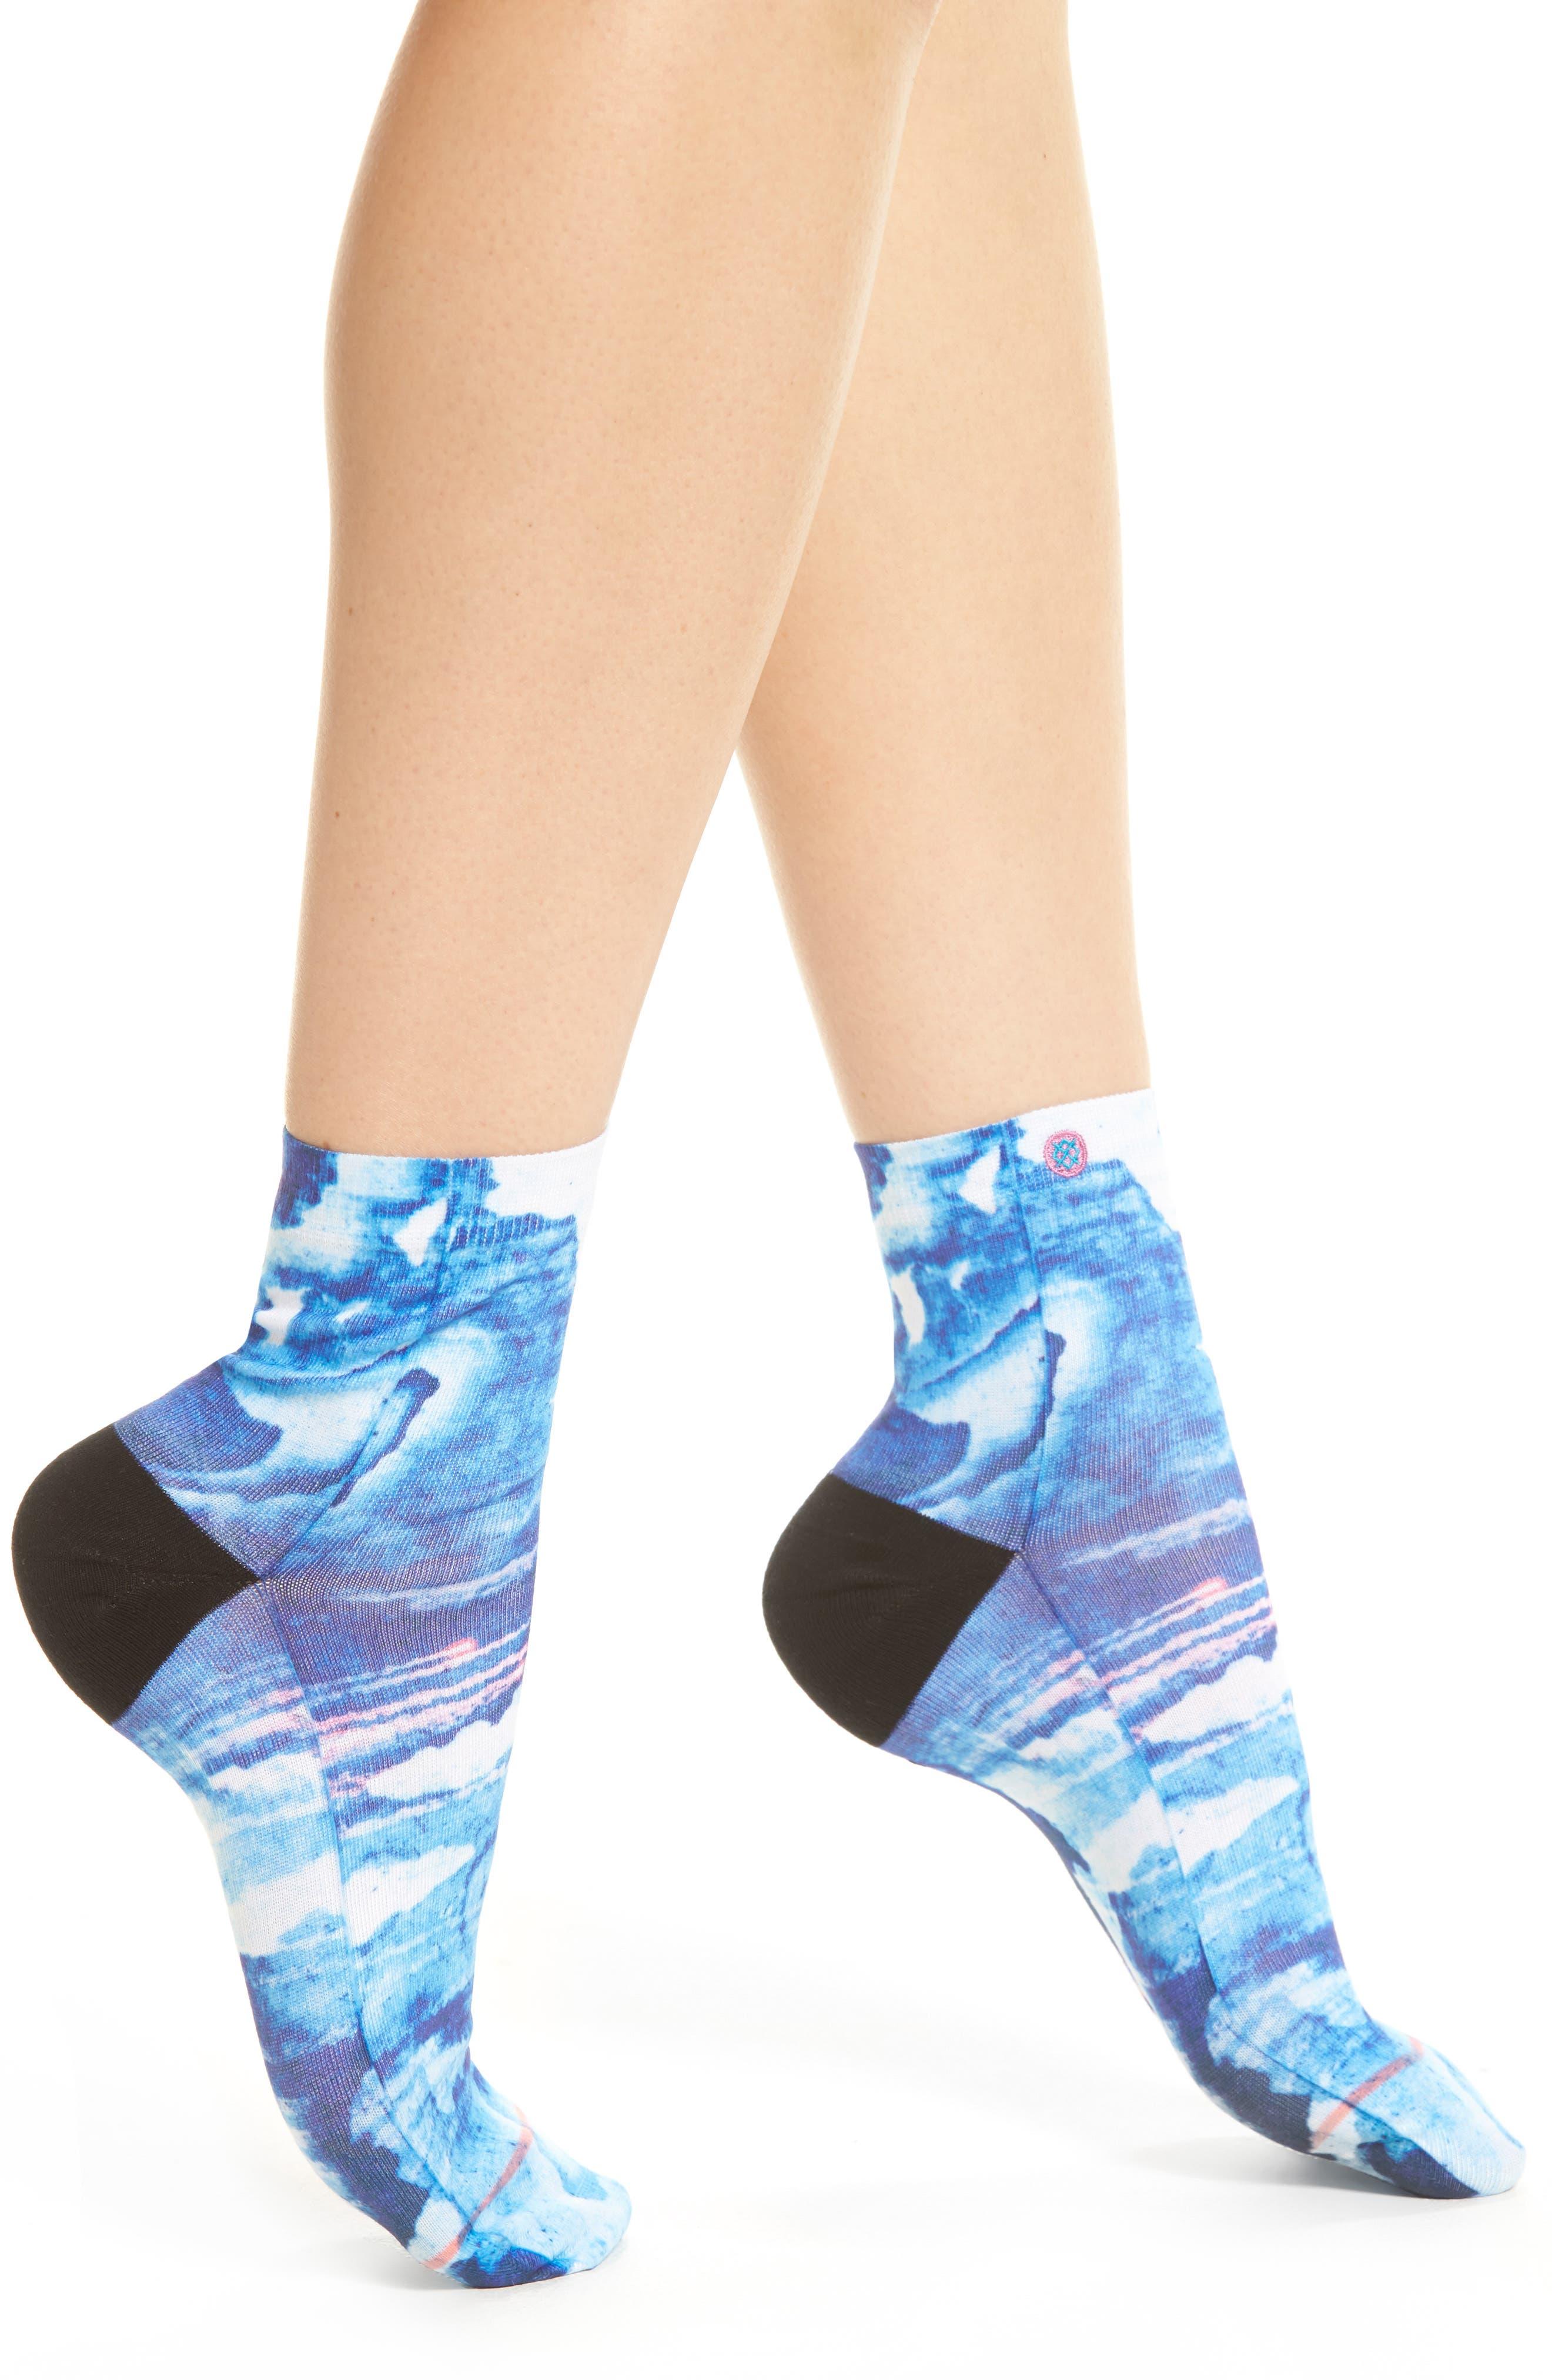 Tropic Storm Ankle Socks,                         Main,                         color, Blue